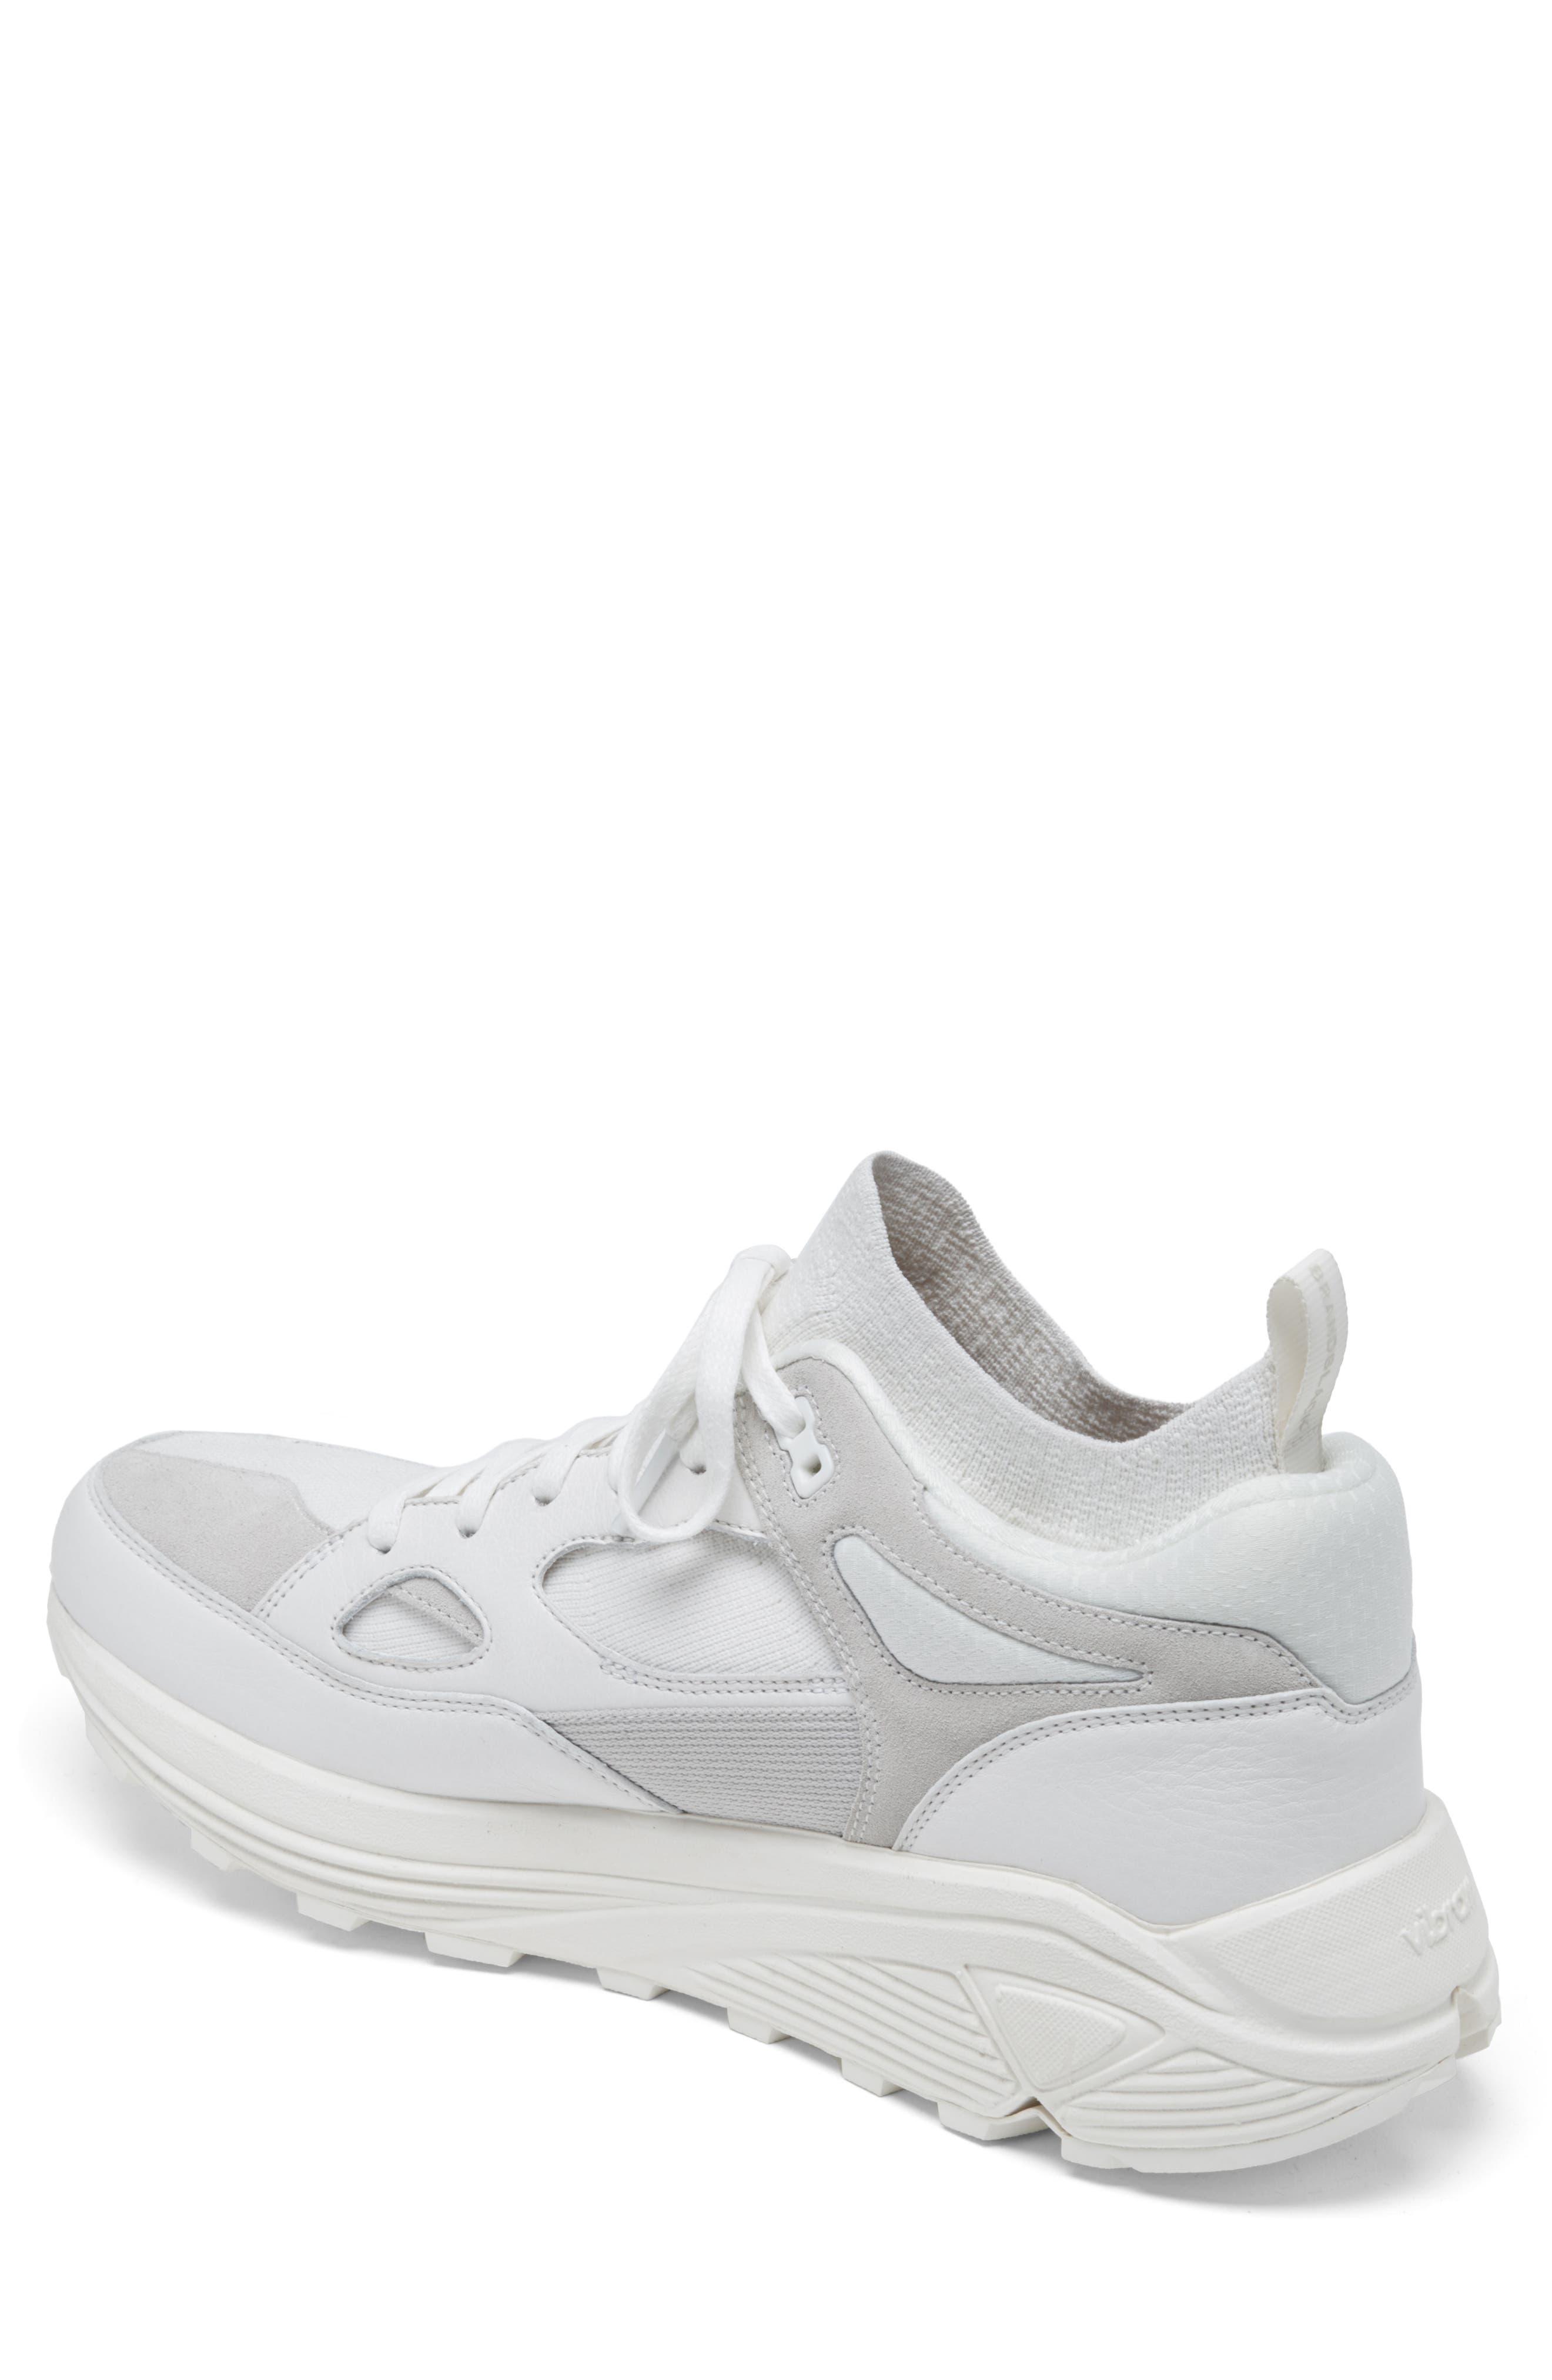 Aura Sneaker,                             Alternate thumbnail 6, color,